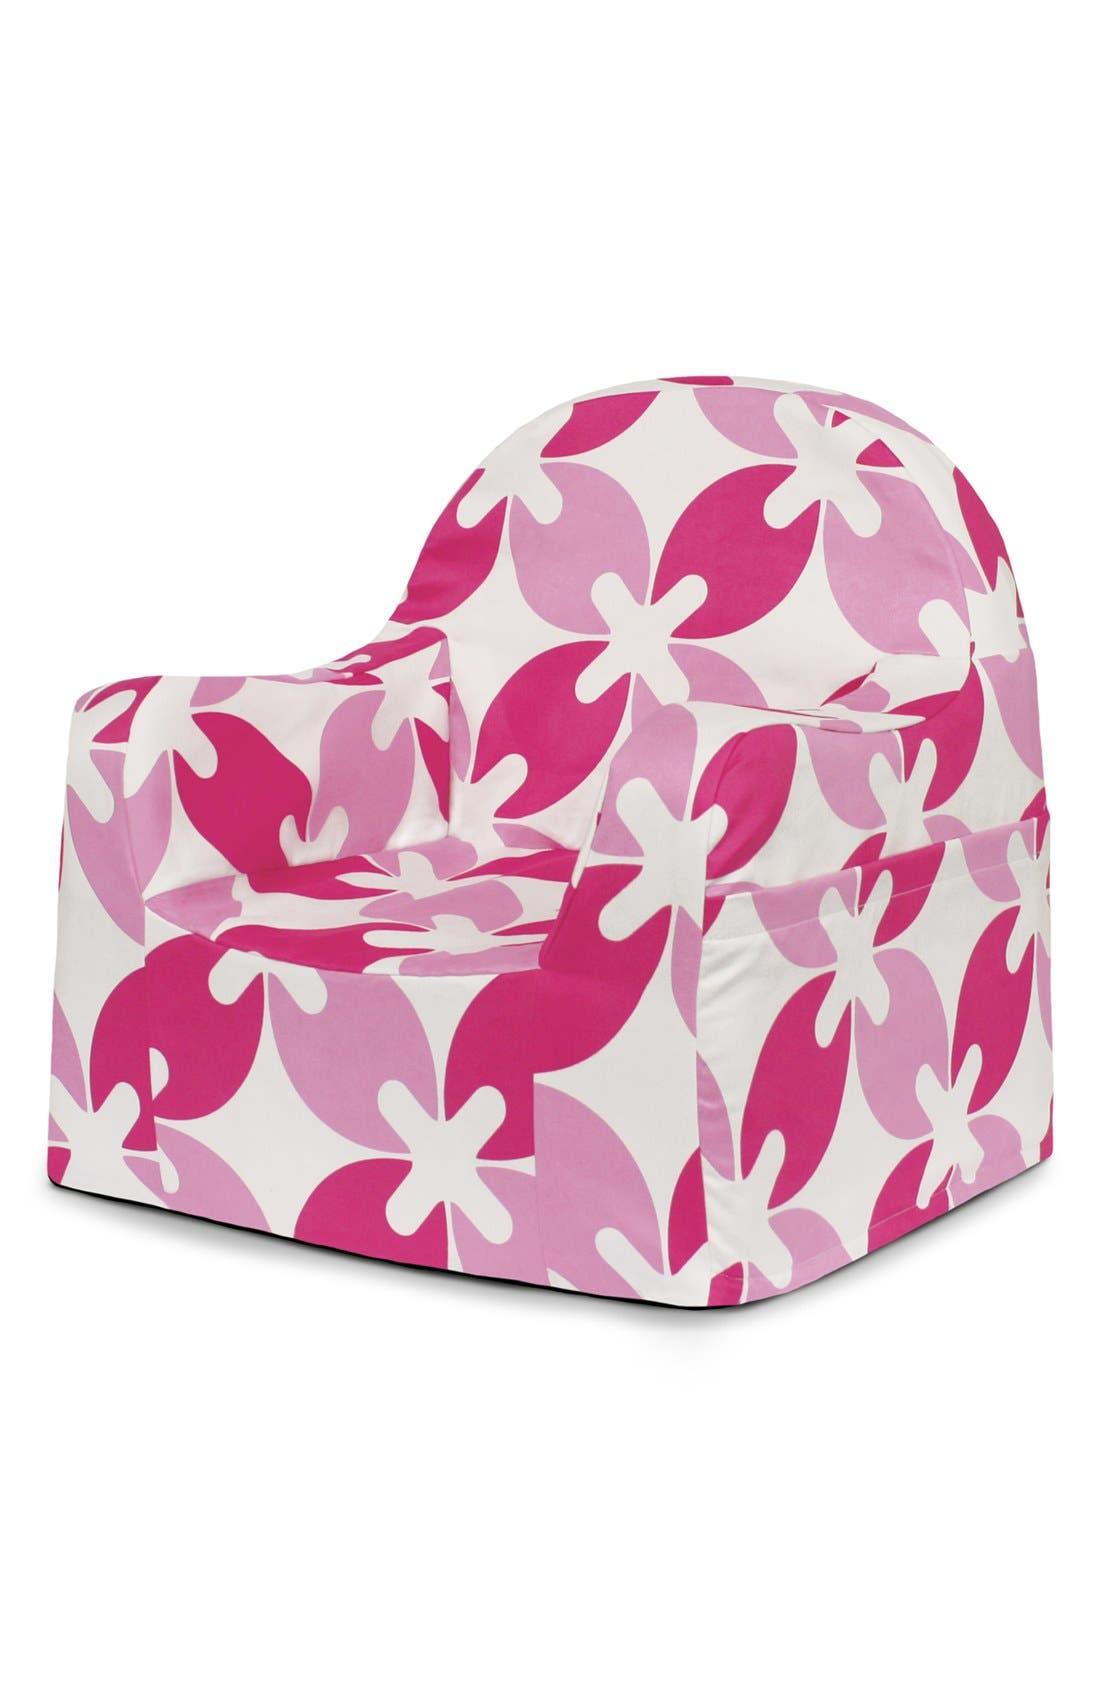 P'KOLINO,                             'Personalized Little Reader' Chair,                             Alternate thumbnail 3, color,                             650